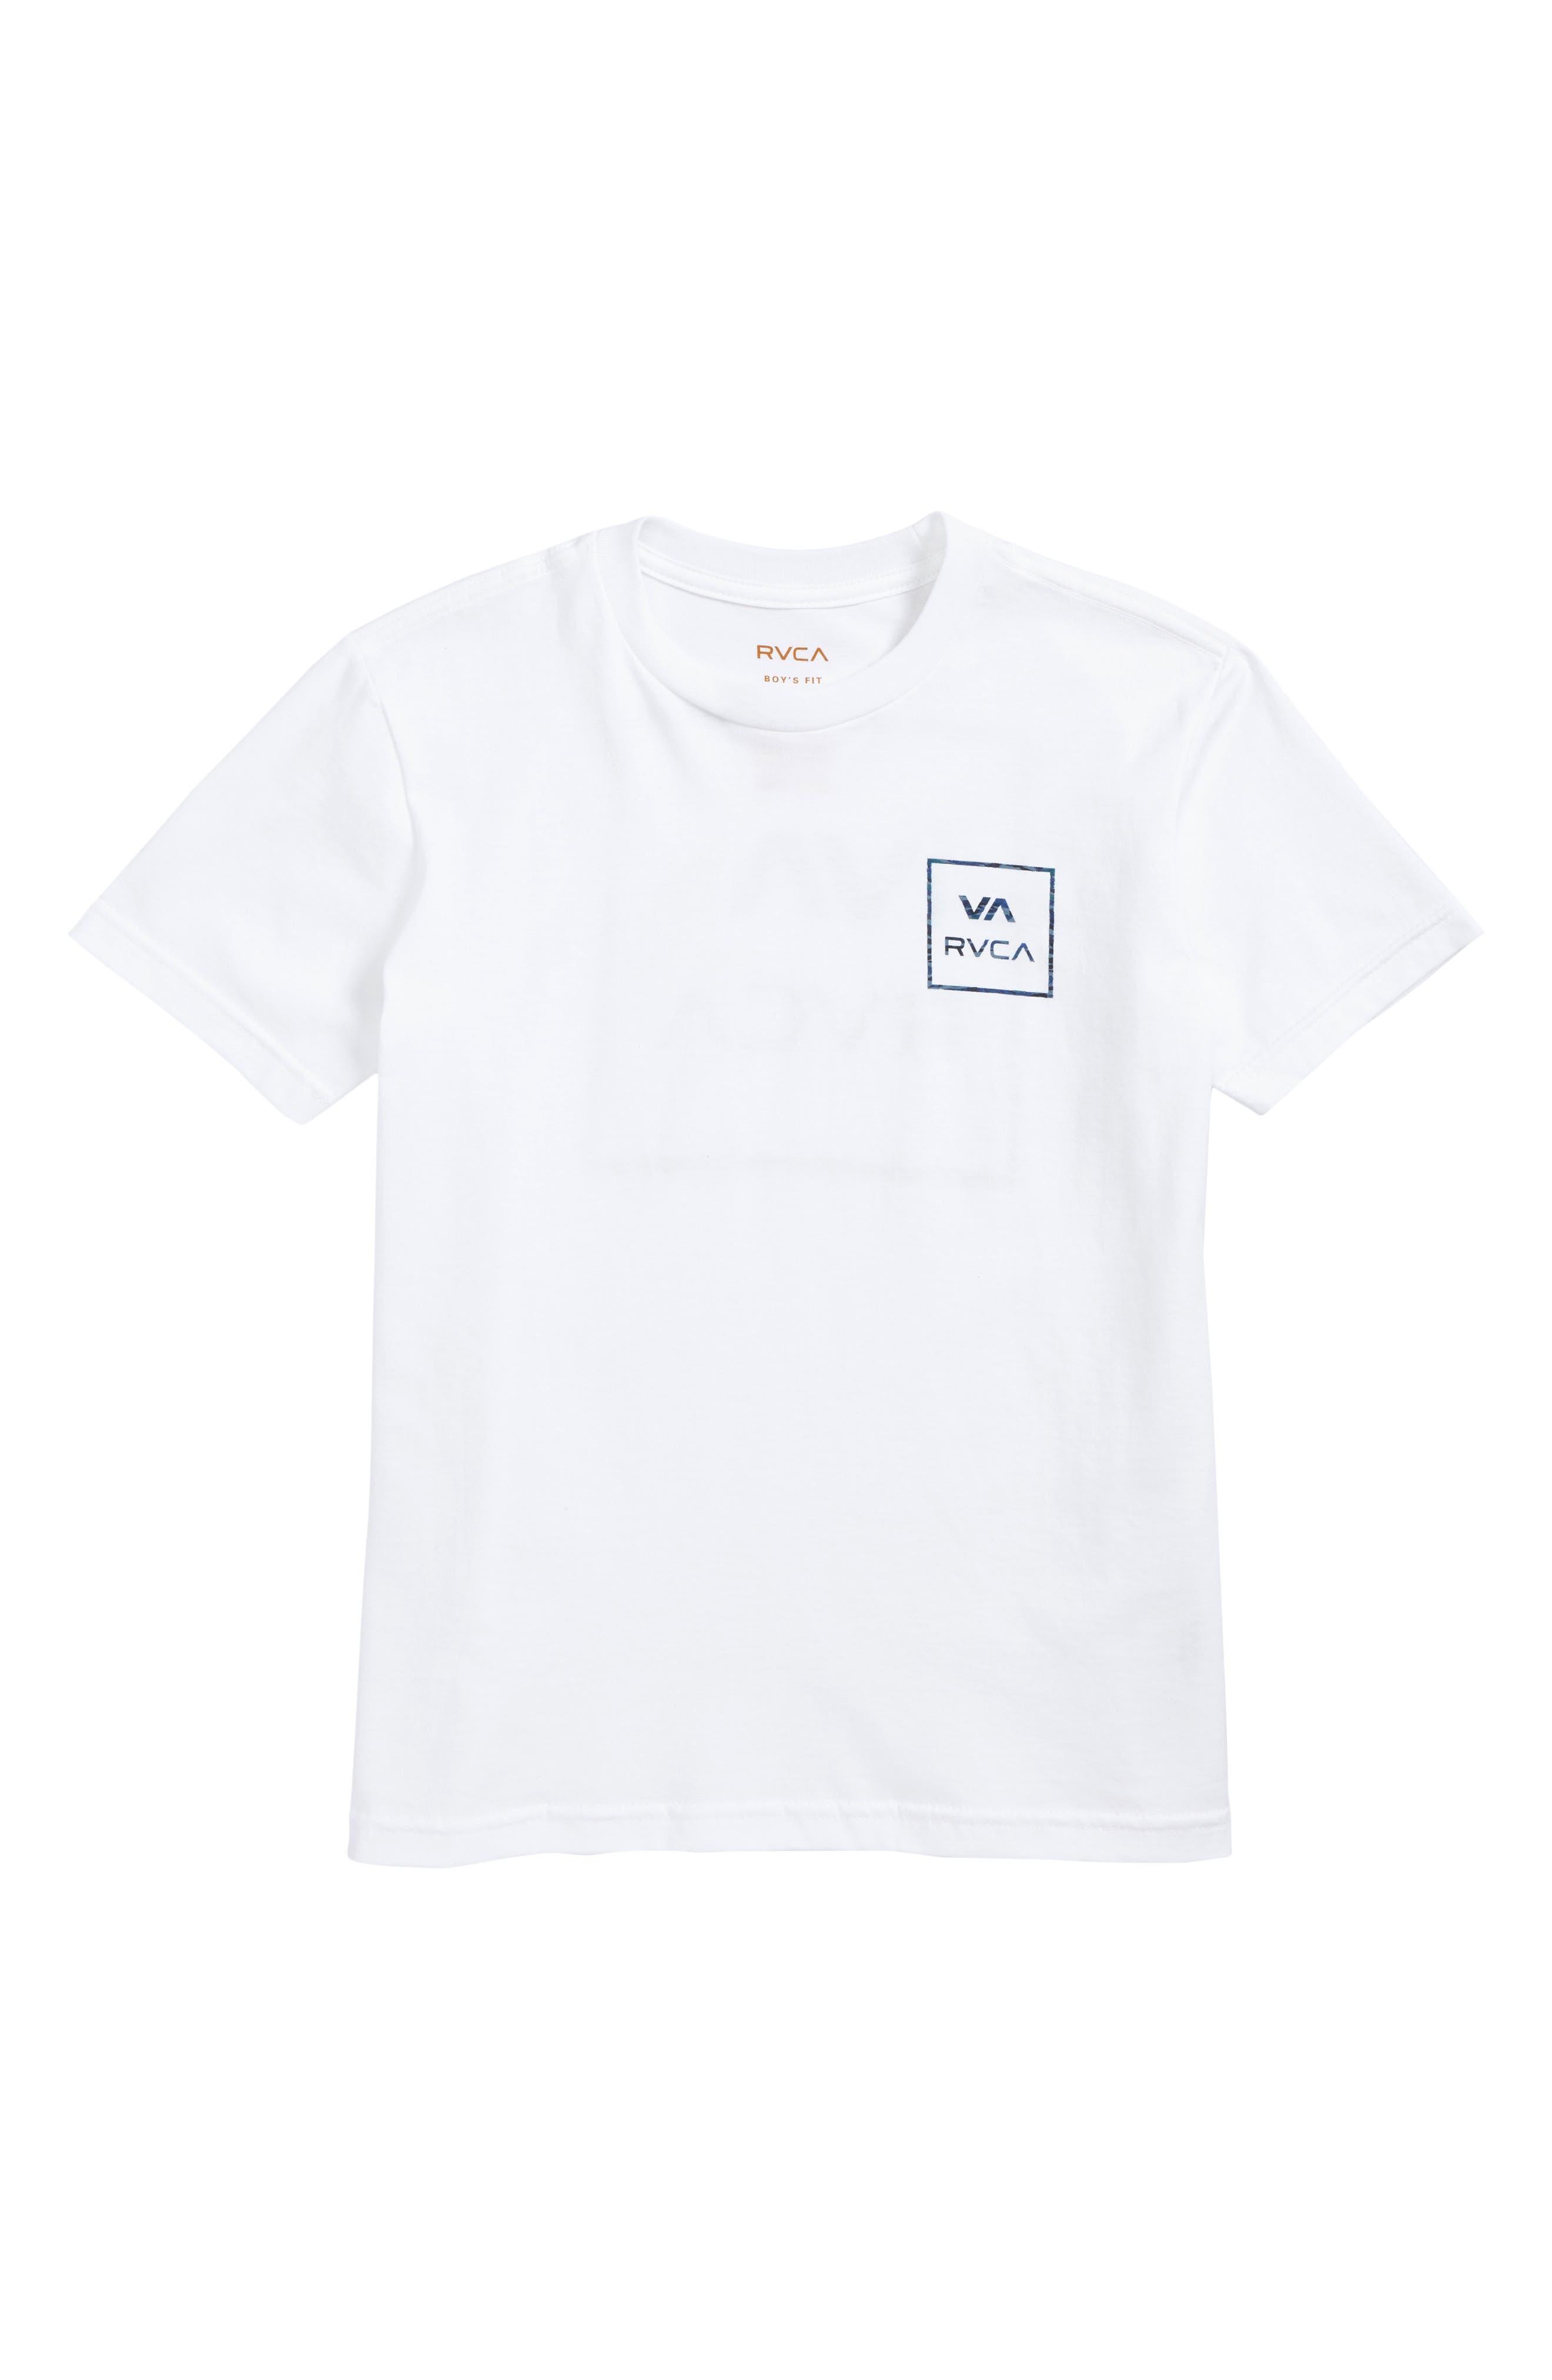 VA all the Way Graphic T-Shirt,                         Main,                         color, 100